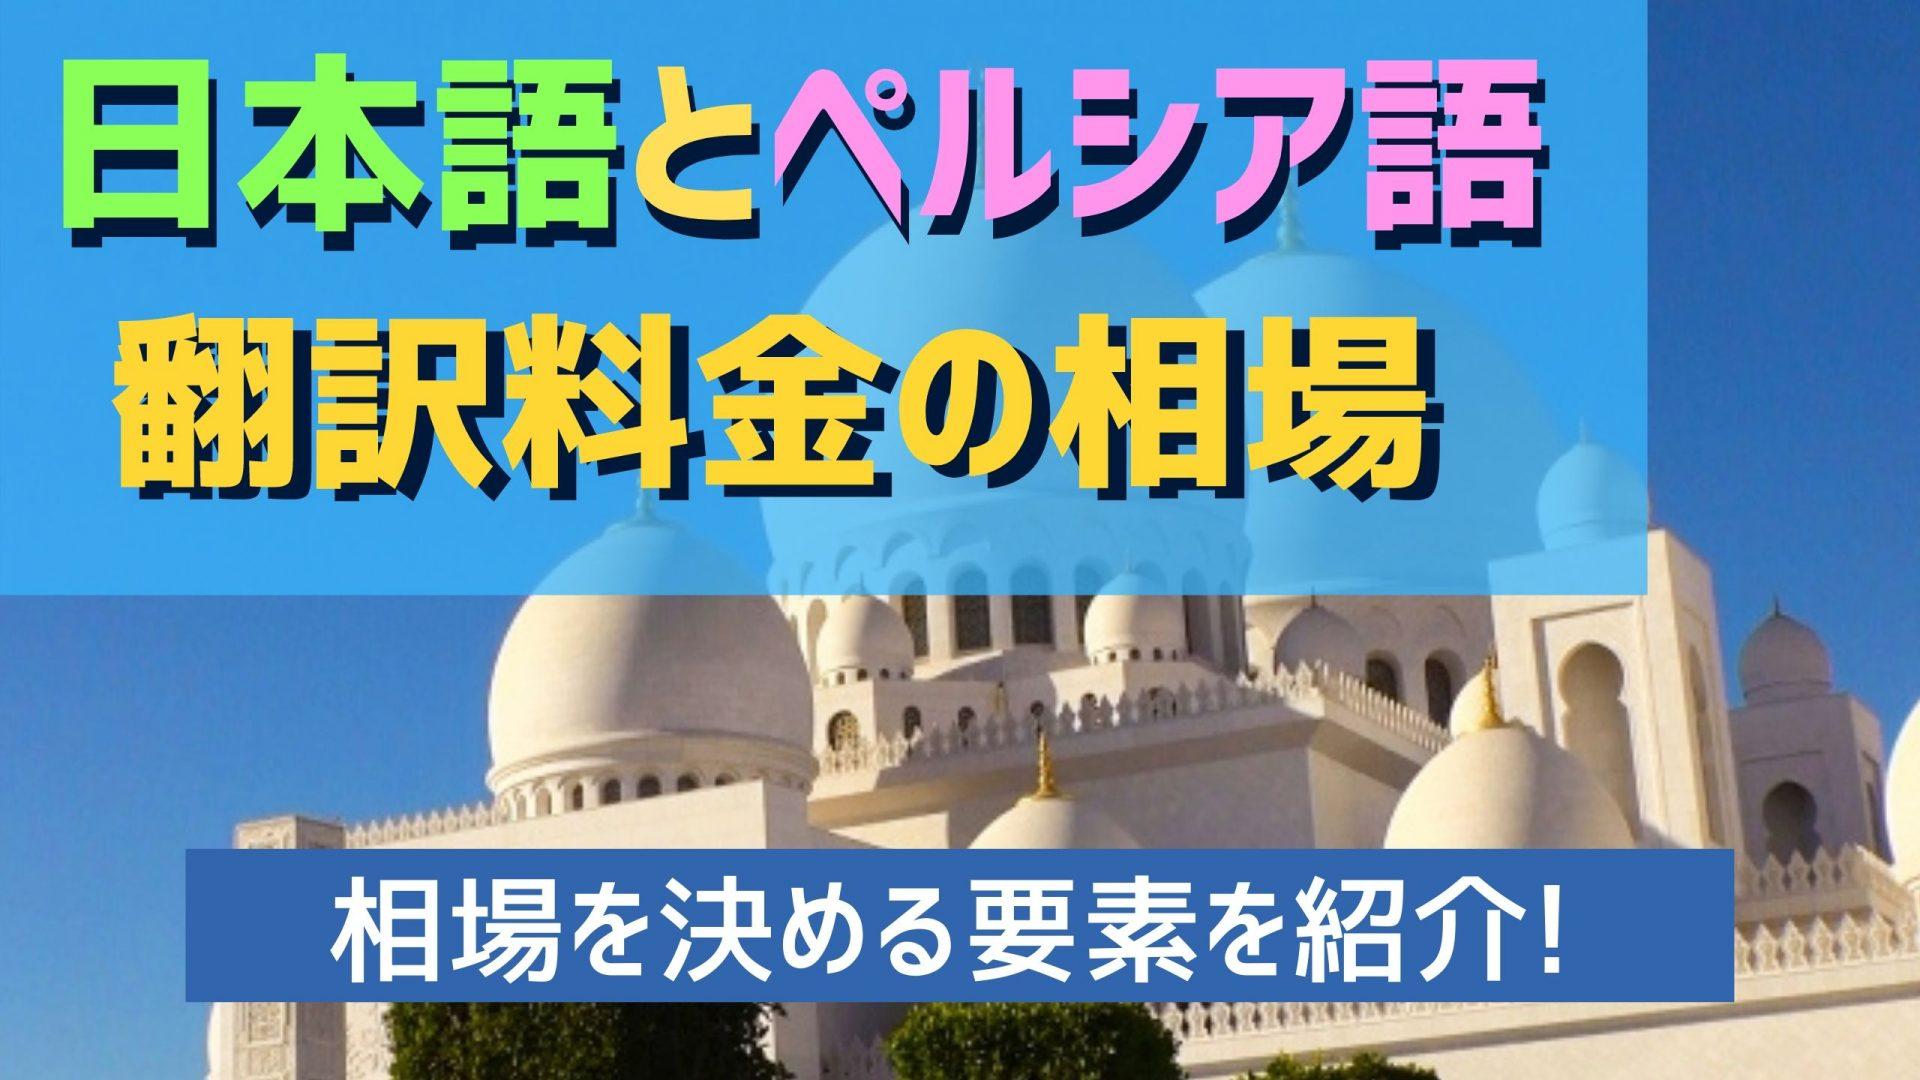 dea1bba0fa5fa56991435e2937964281 - 日本語からペルシア語、ペルシア語から日本語への翻訳料金の相場は?